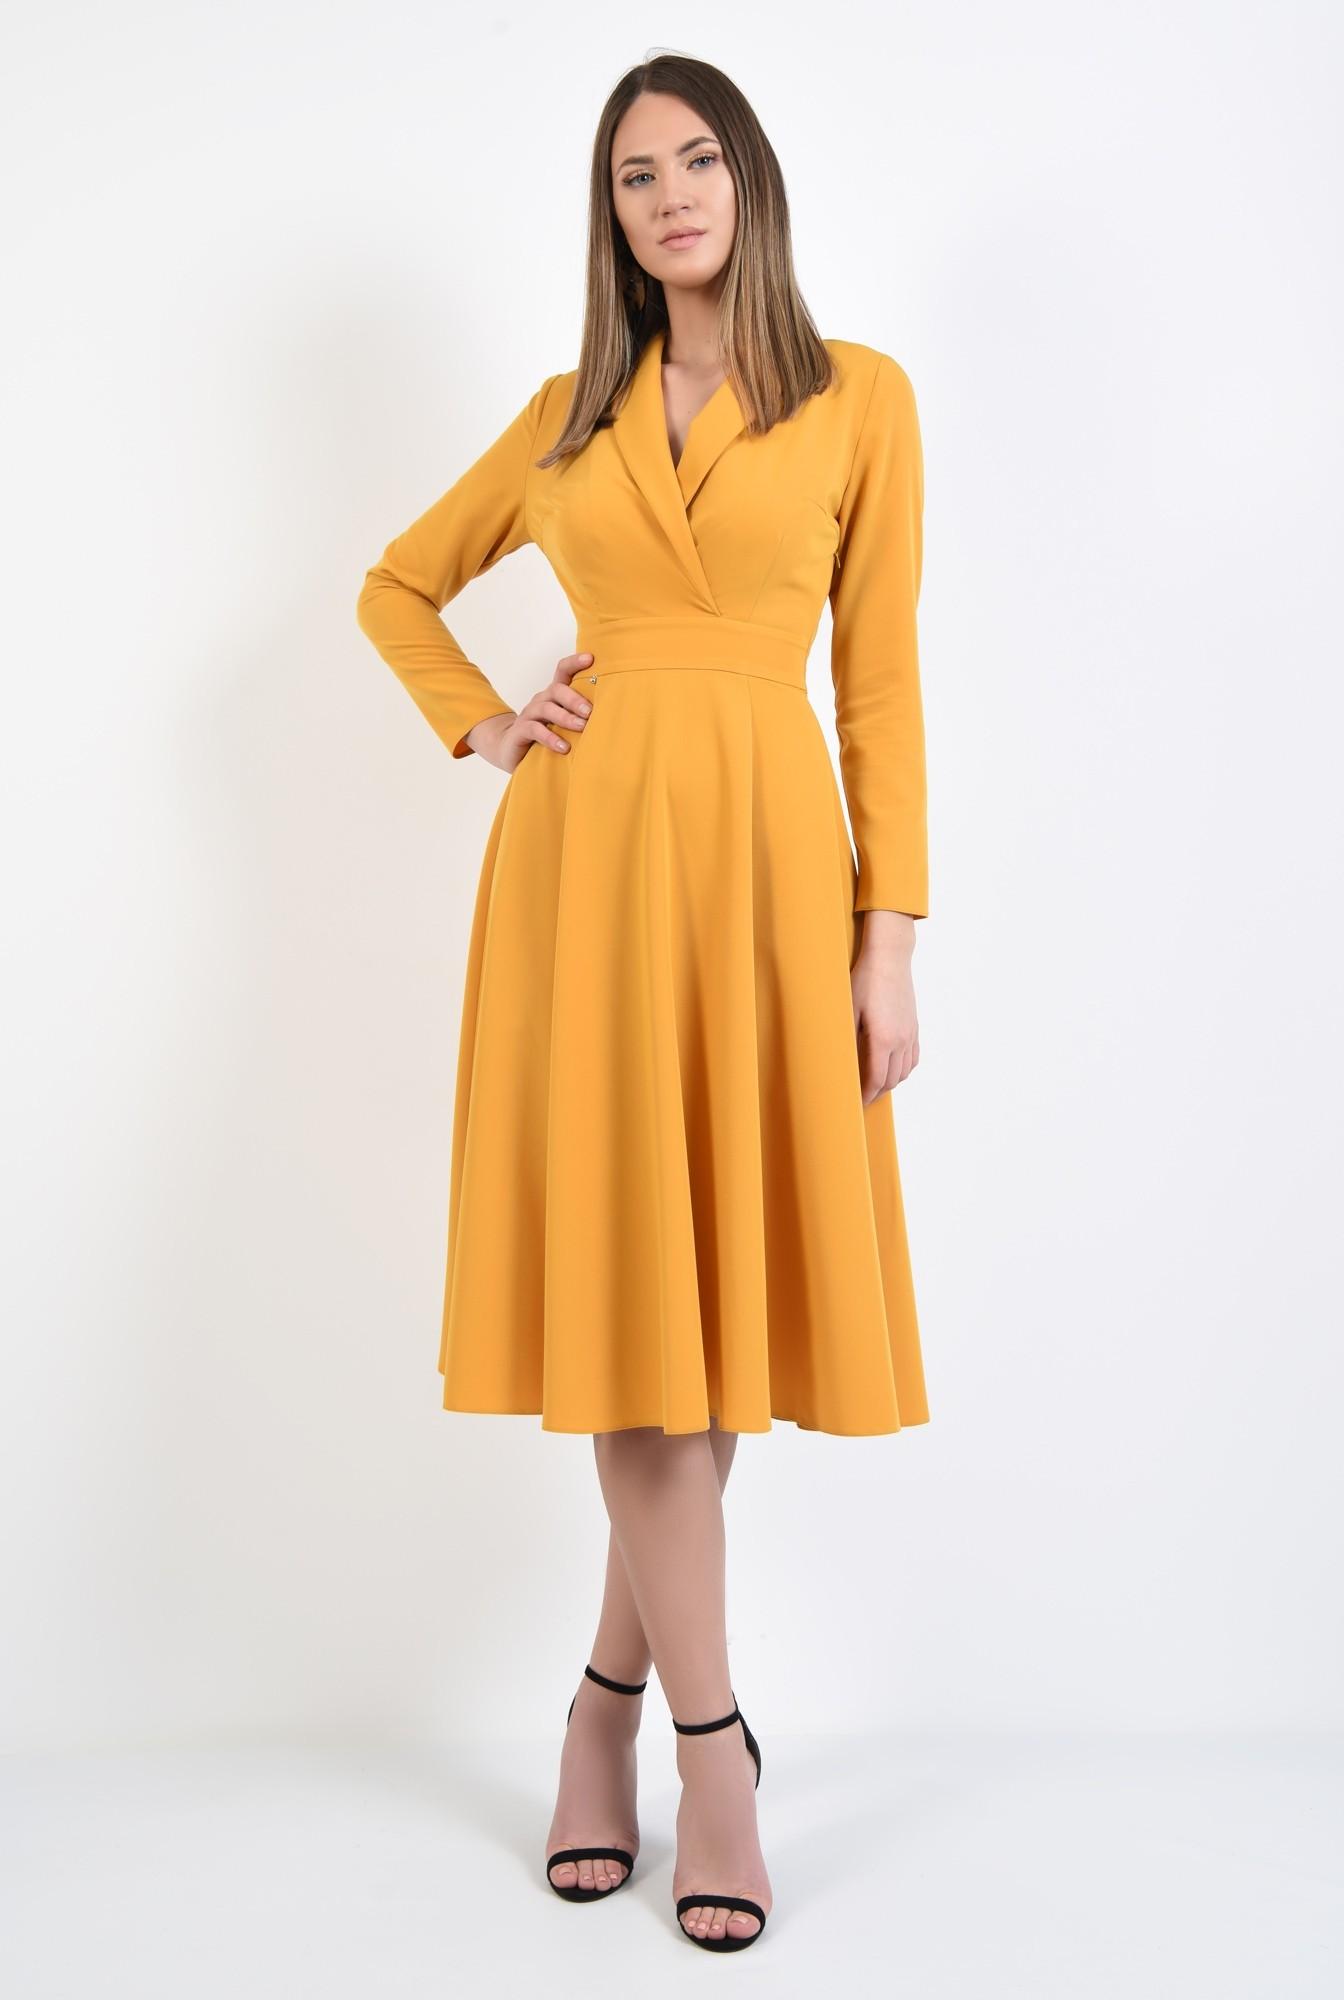 3 - rochie eleganta, de zi, mustar, maneci ajustate, anchior petrecut